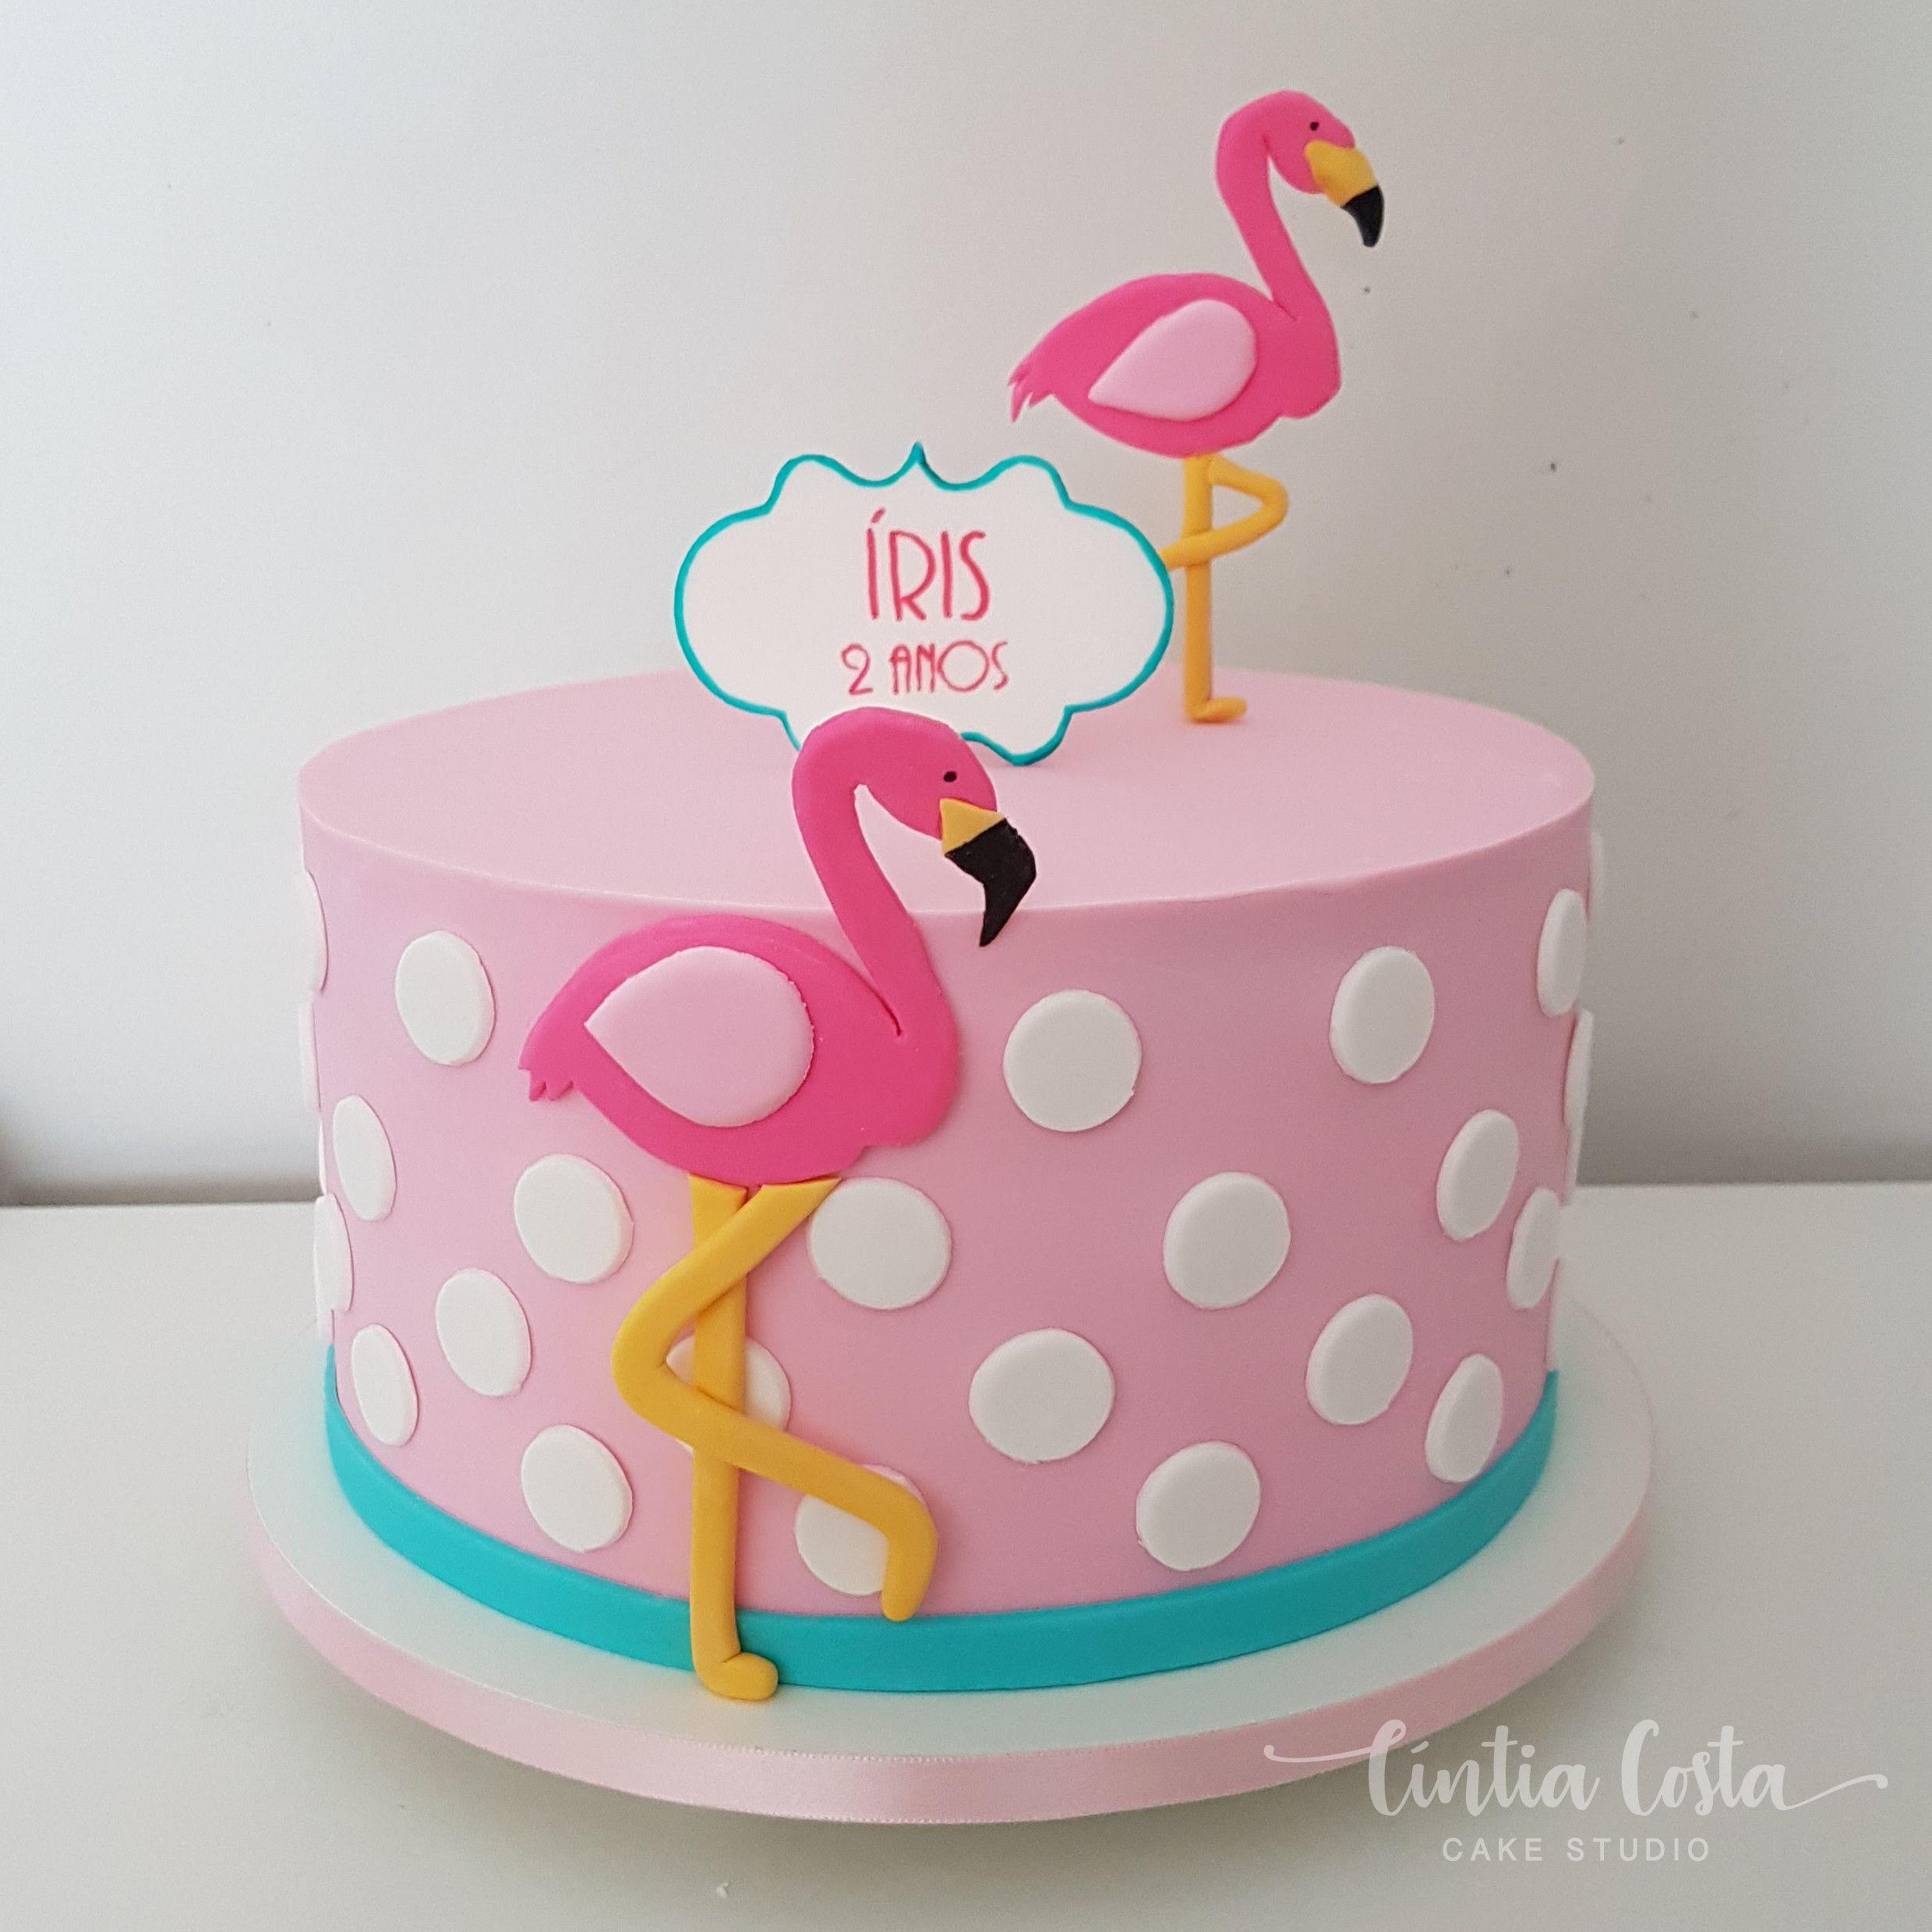 Bolo Flamingo Para Festa De Menina Cíntia Costa